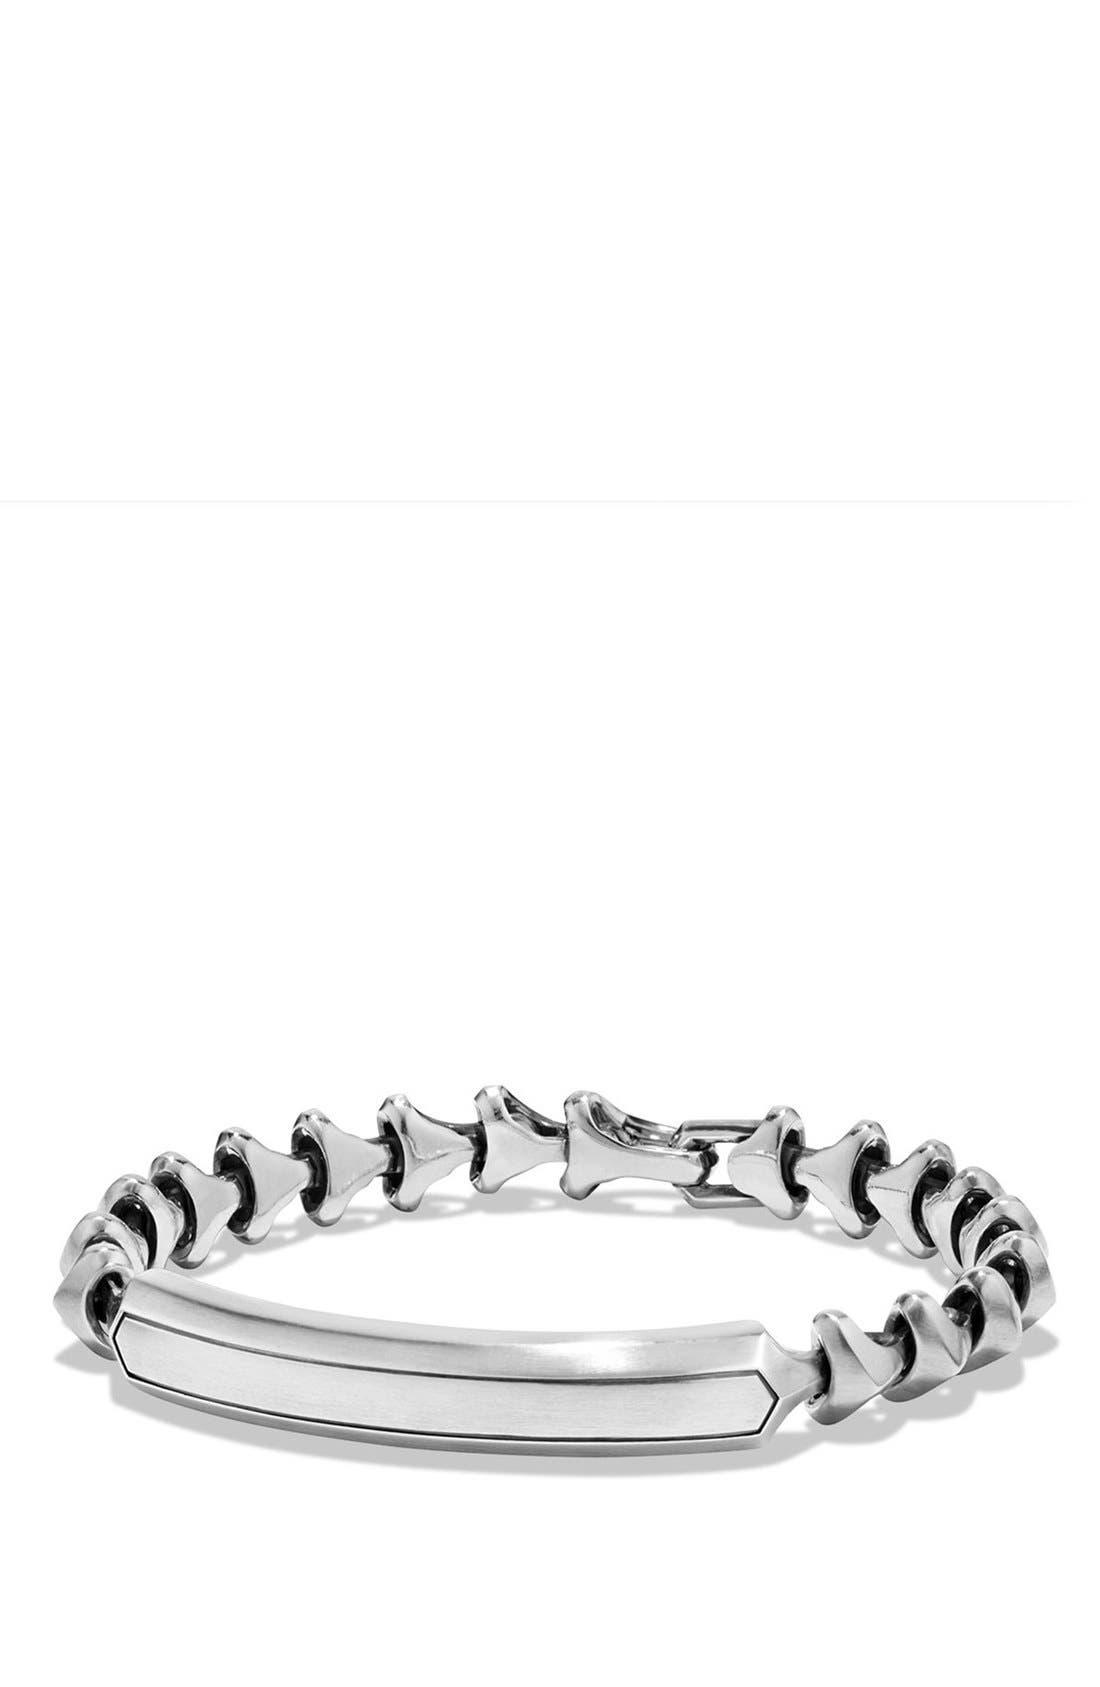 'Armory' Single Row ID Bracelet,                             Main thumbnail 1, color,                             Silver